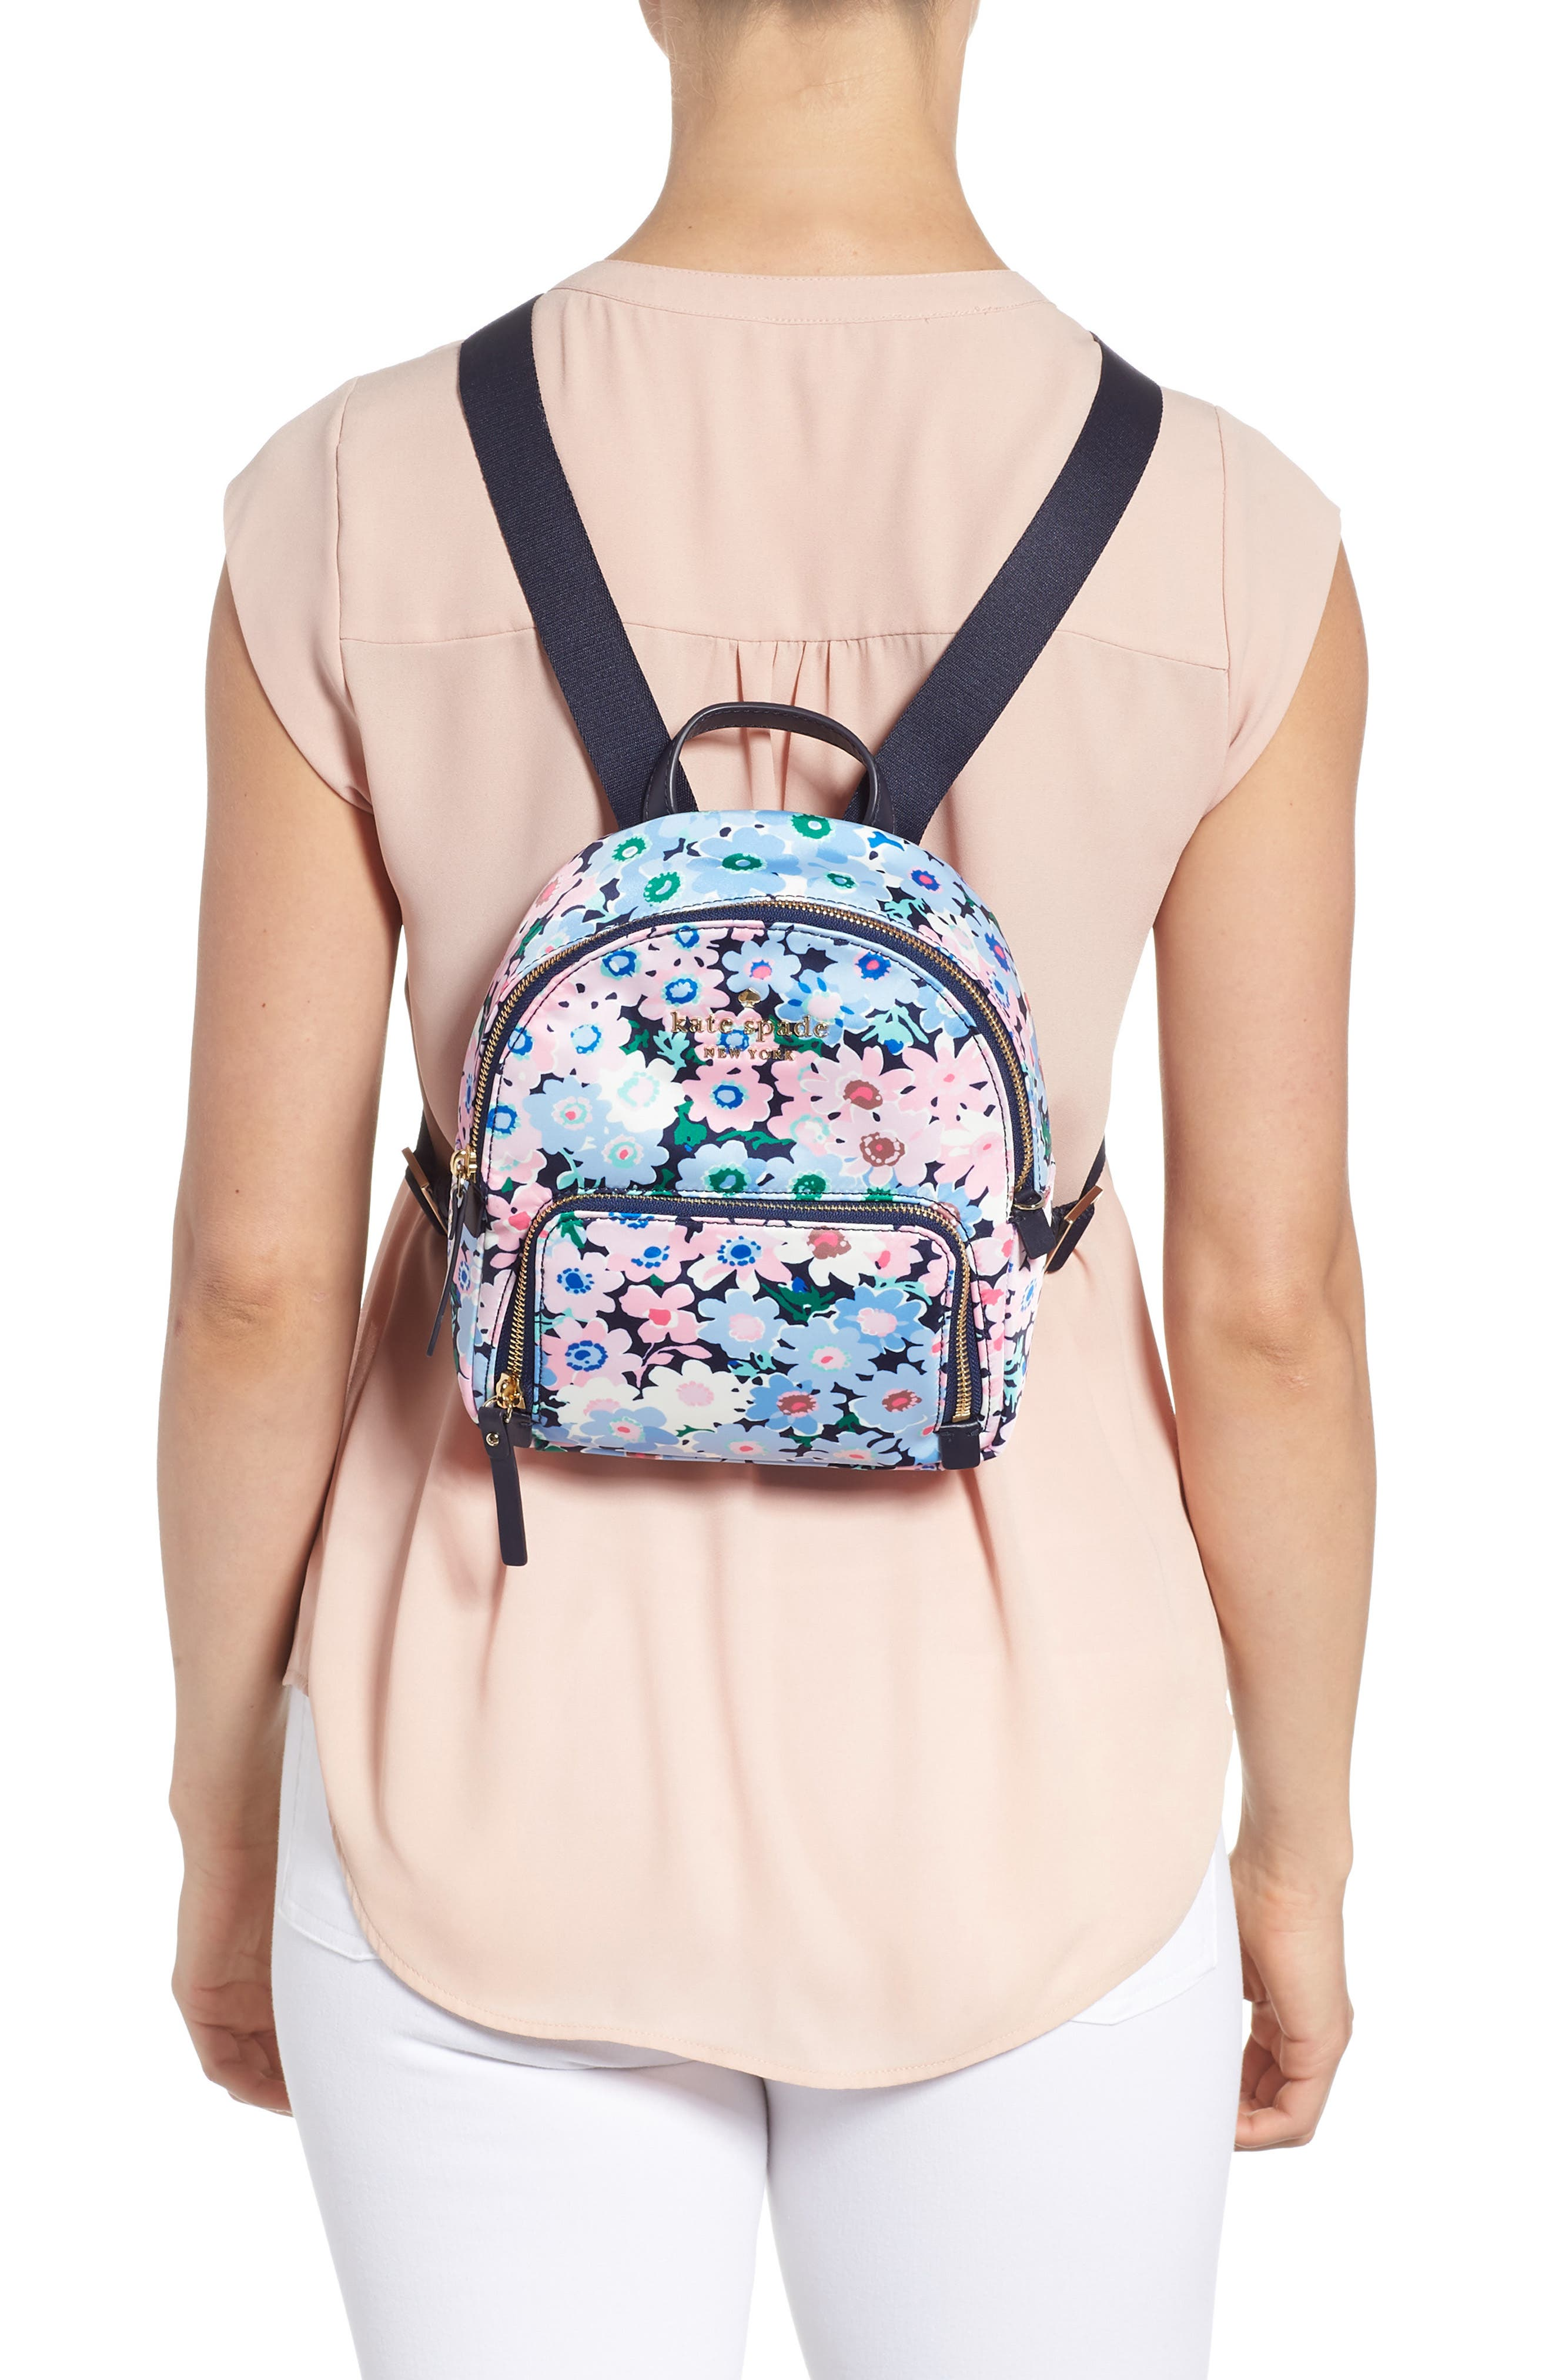 watson lane - daisy garden small hartley backpack,                             Alternate thumbnail 2, color,                             400